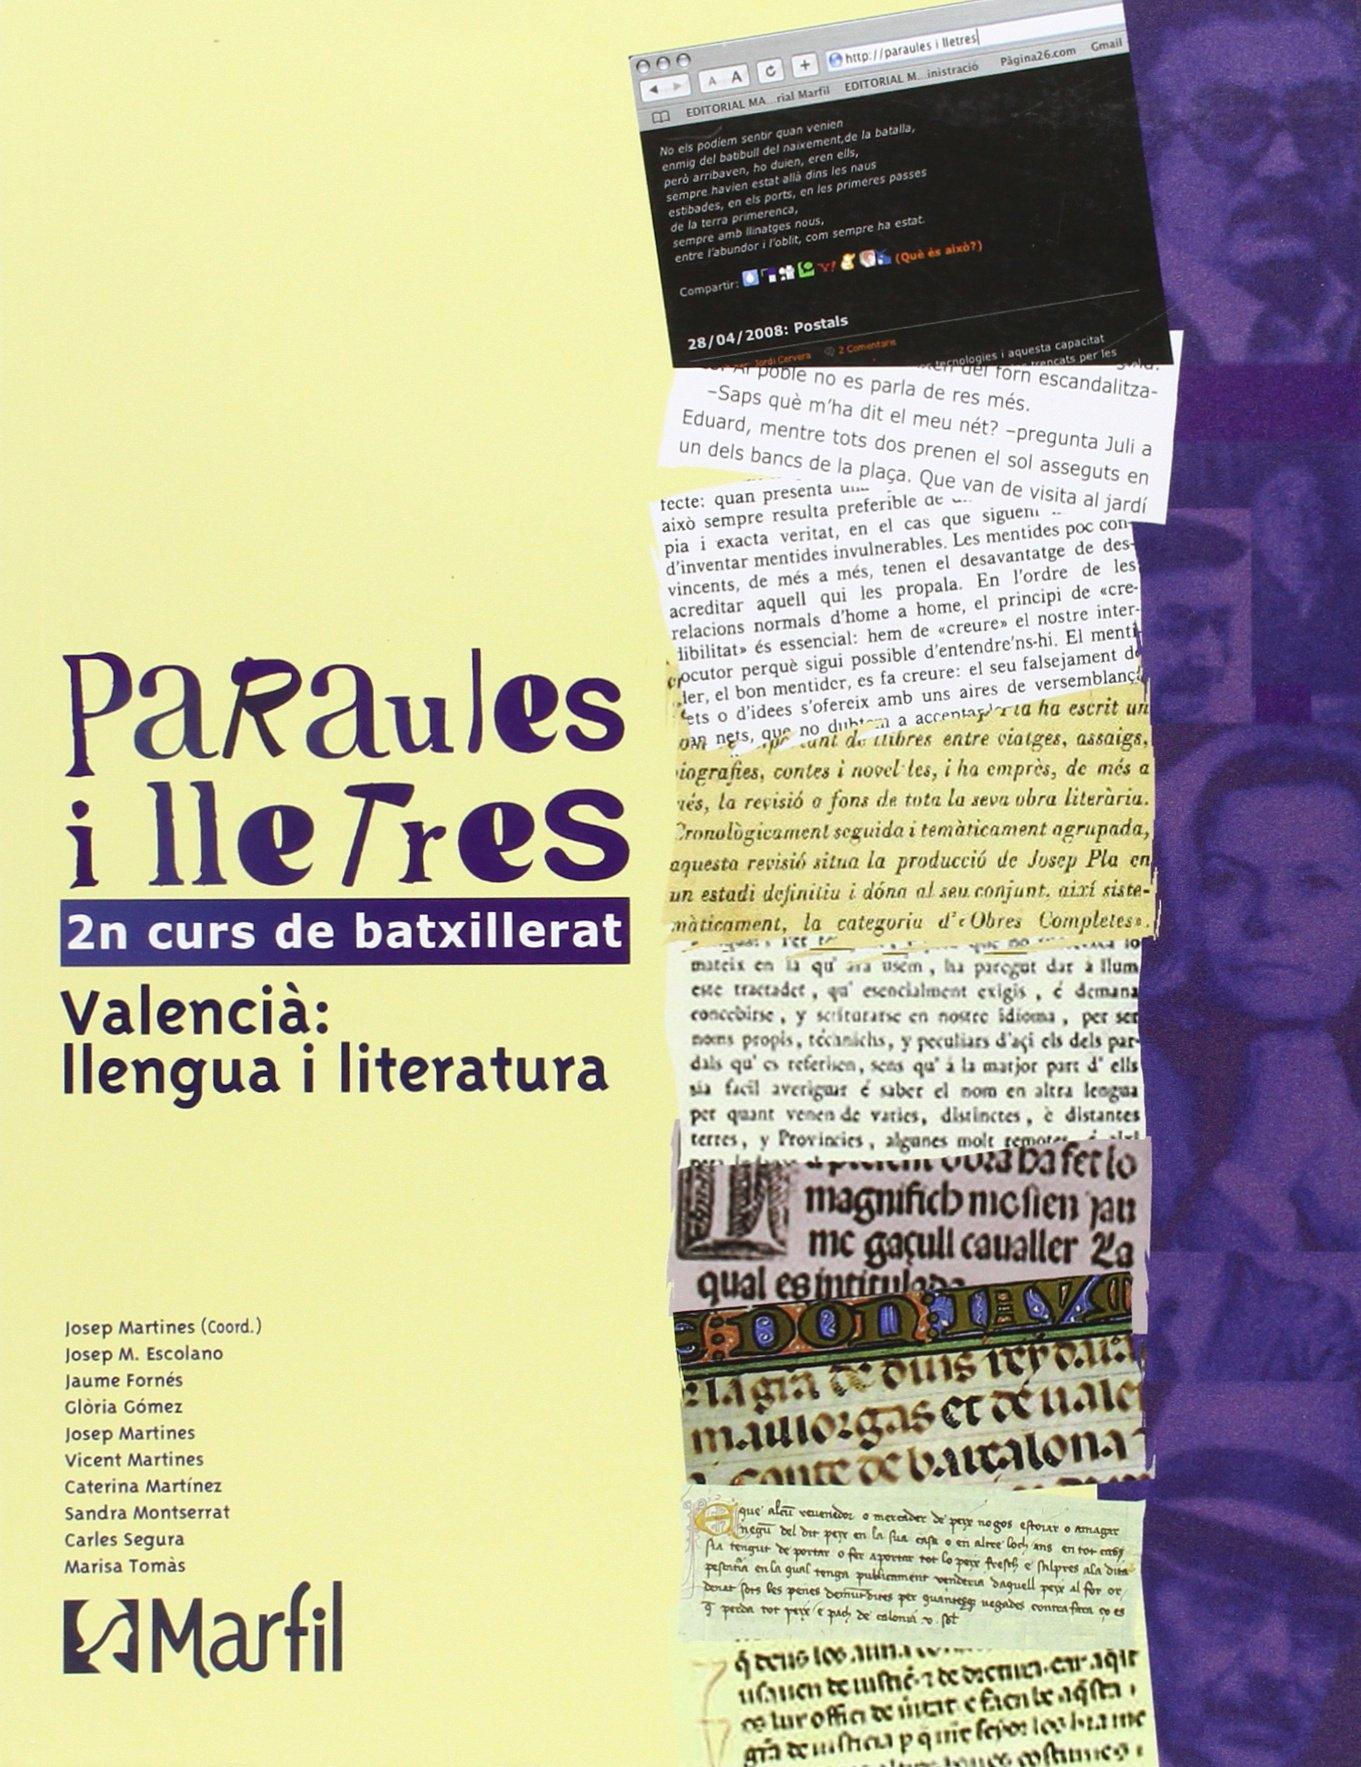 Bach 2 - Paraules I Lletres 2 Batxillerat Pau valencia - 9788426815217: Amazon.es: AA.VV.: Libros